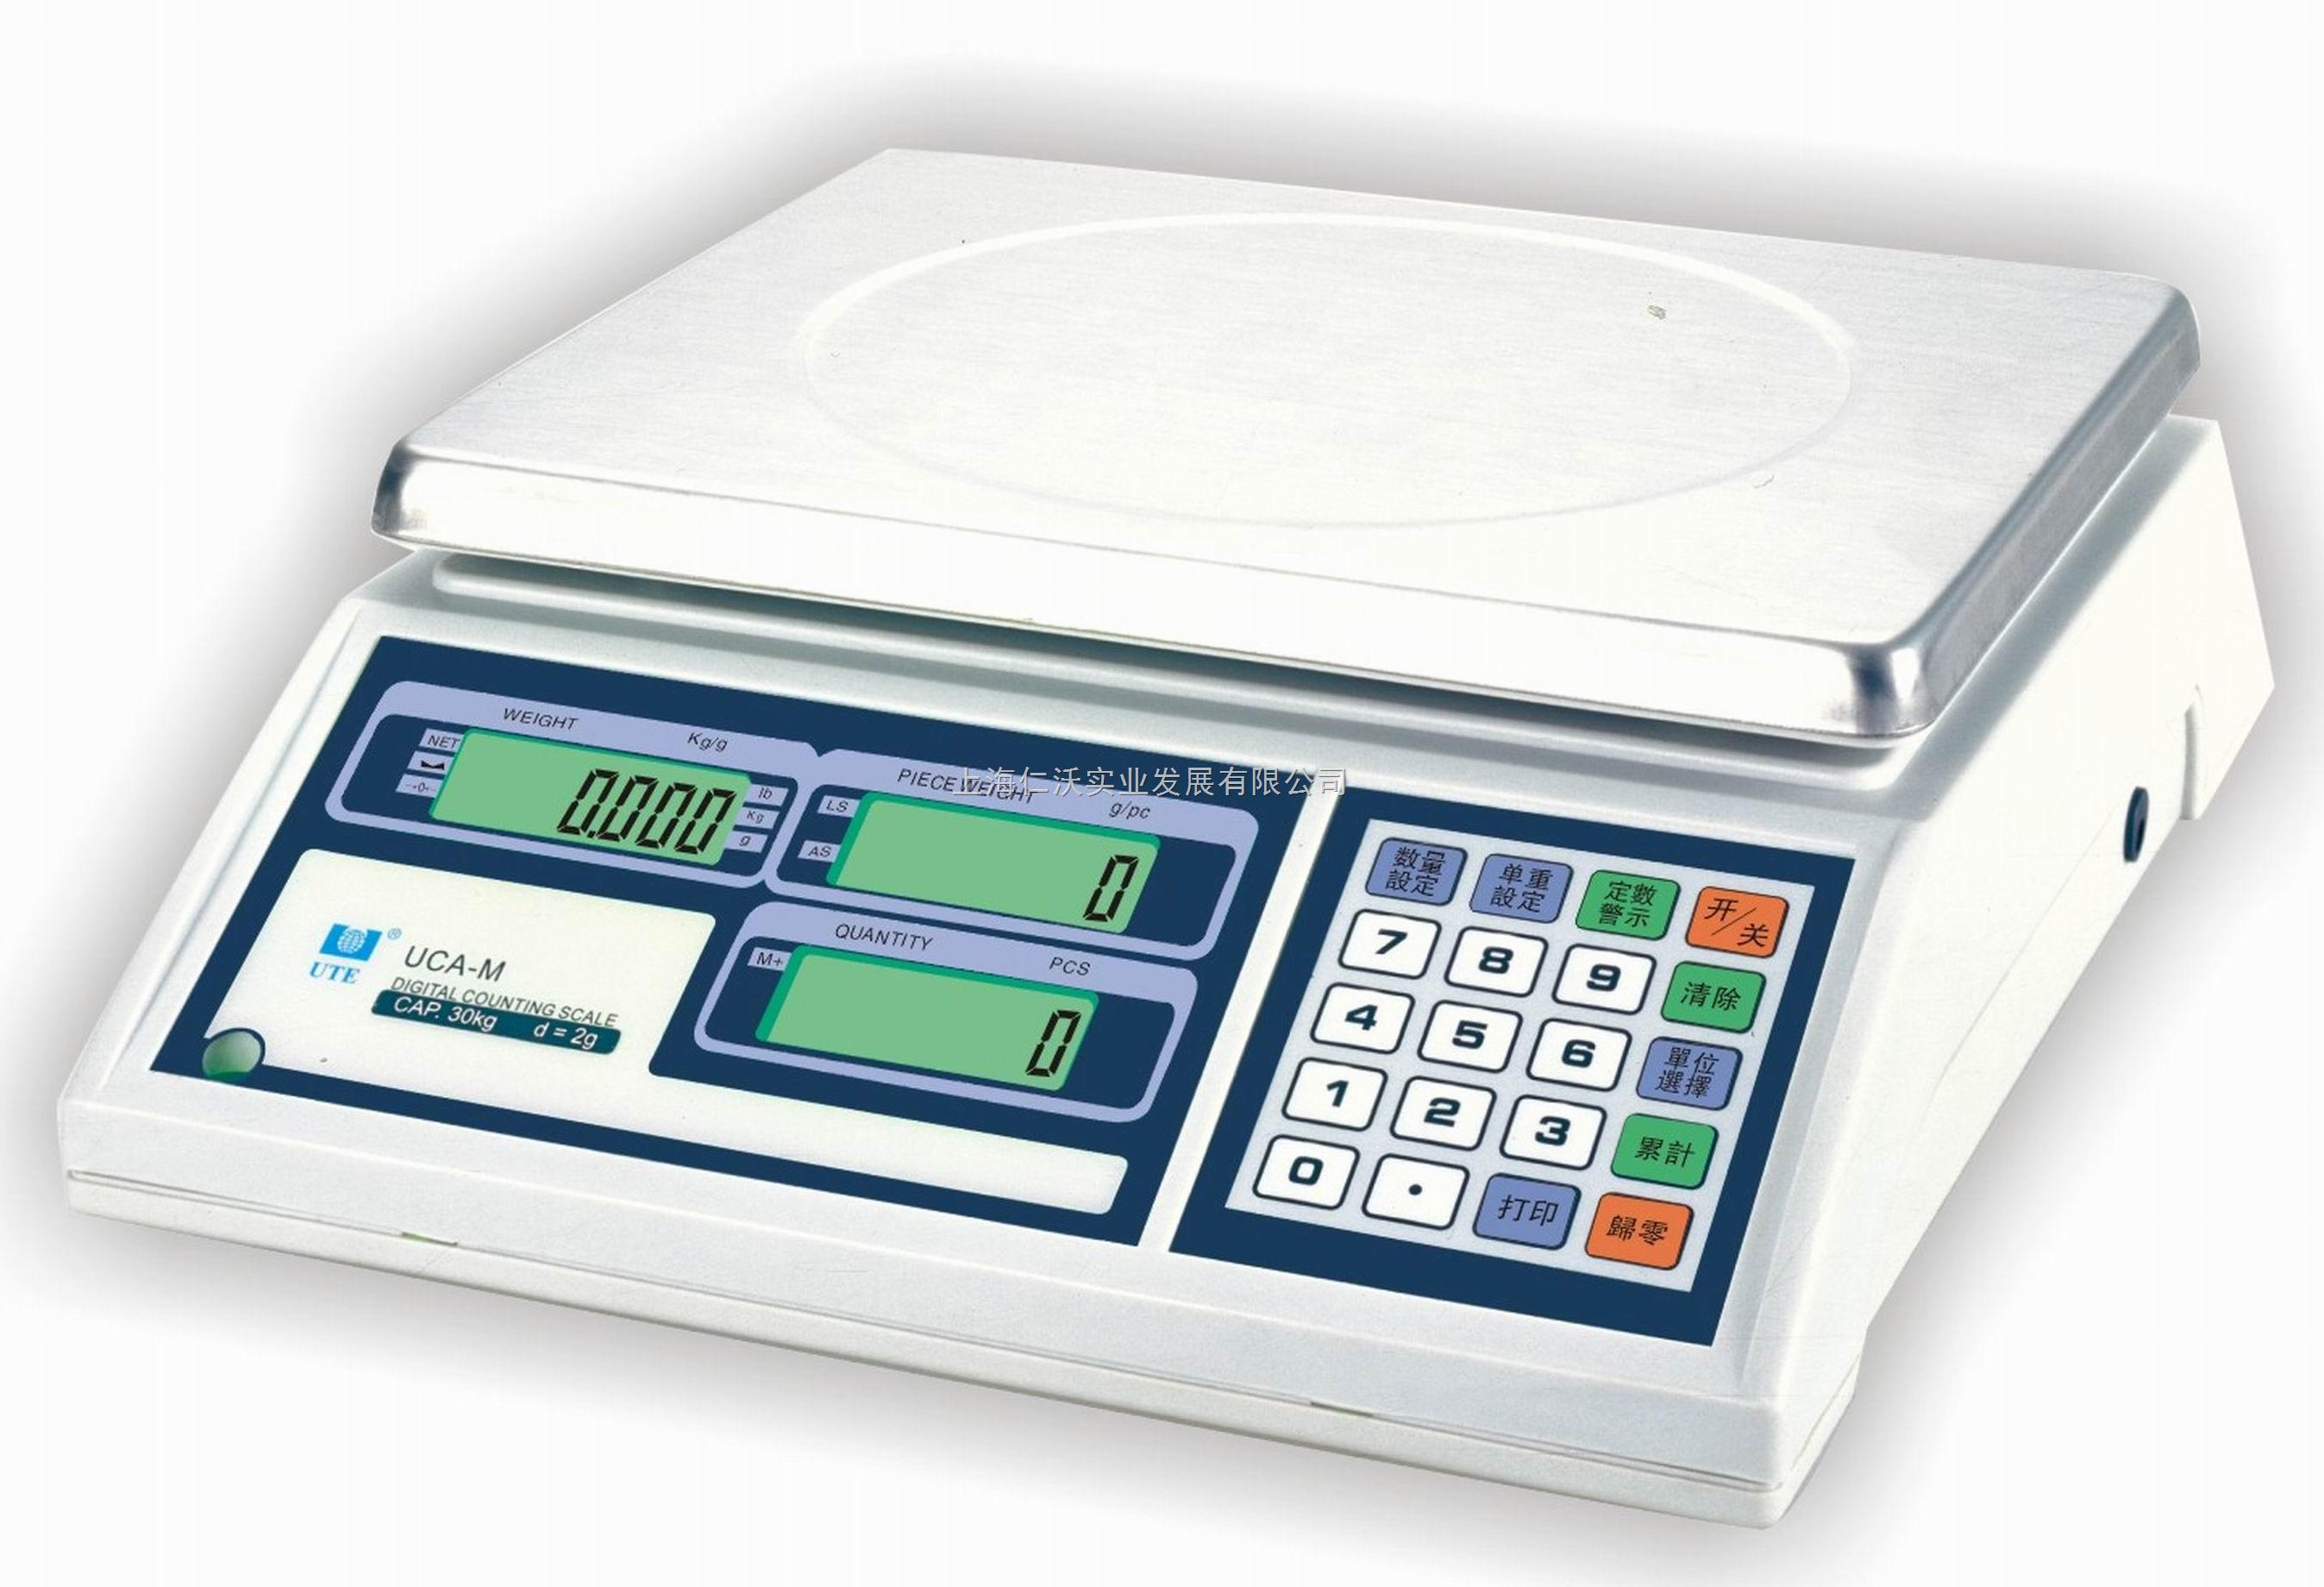 台湾UTE联贸UCA-M电子称CAP:1.5kg/d=0.1g